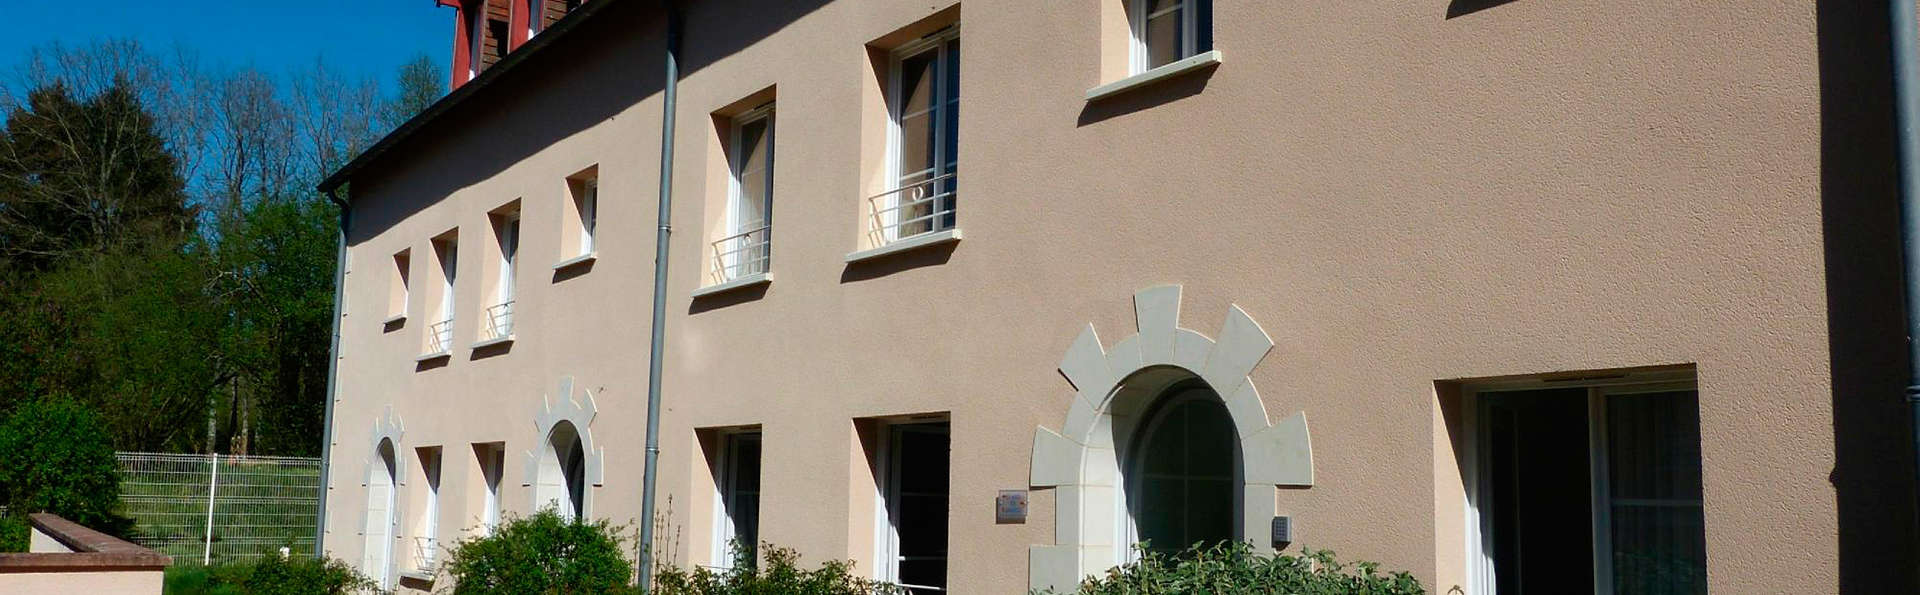 AppartHotel La Roche Posay - EDIT_front2.jpg